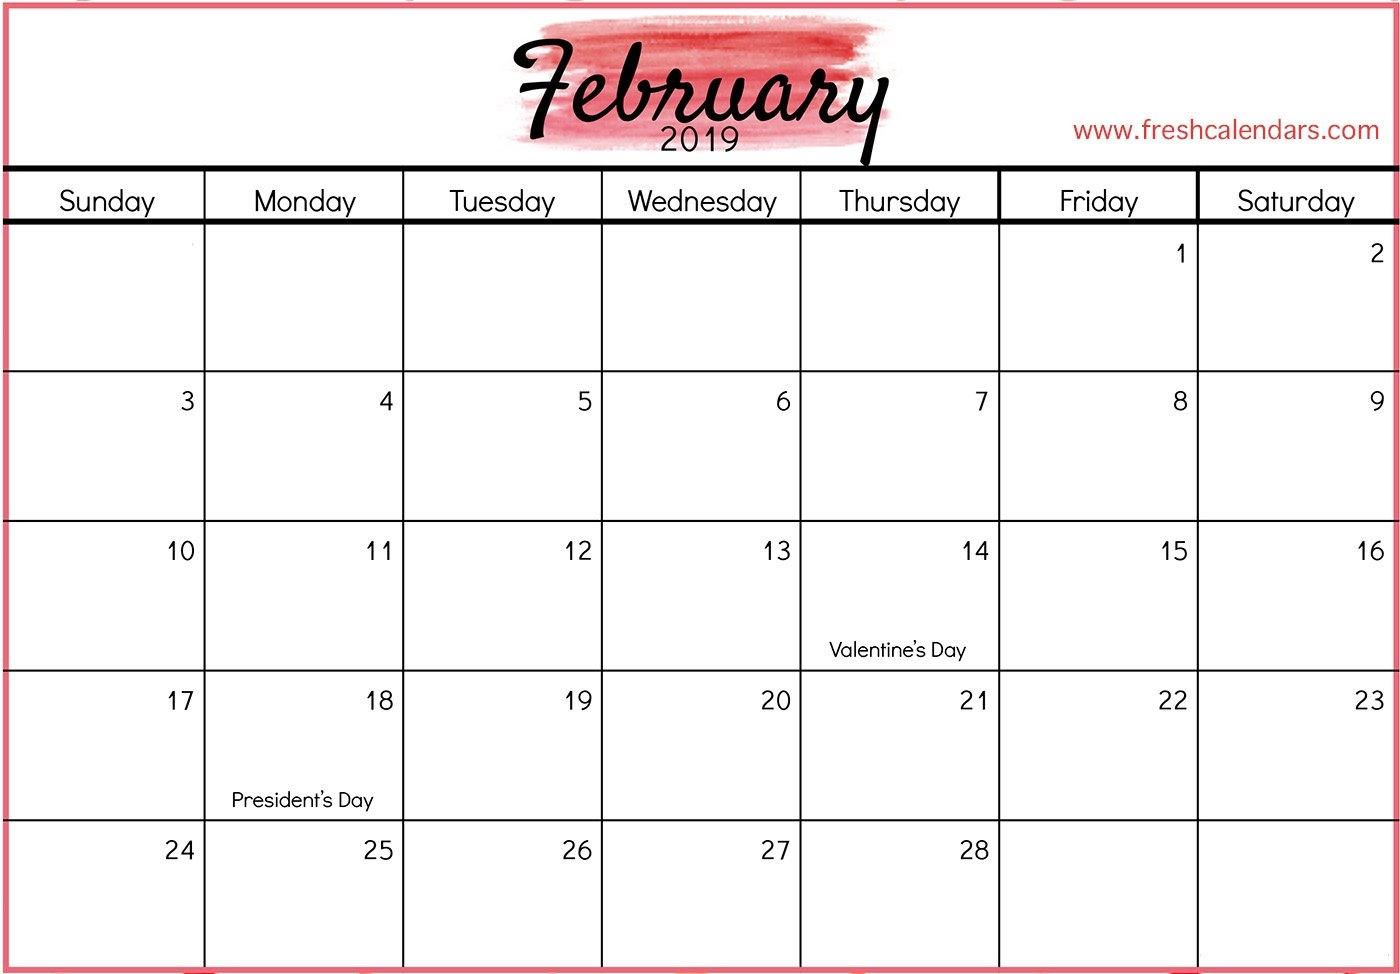 February 2019 Printable Calendars - Fresh Calendars Feb 9 2019 Calendar